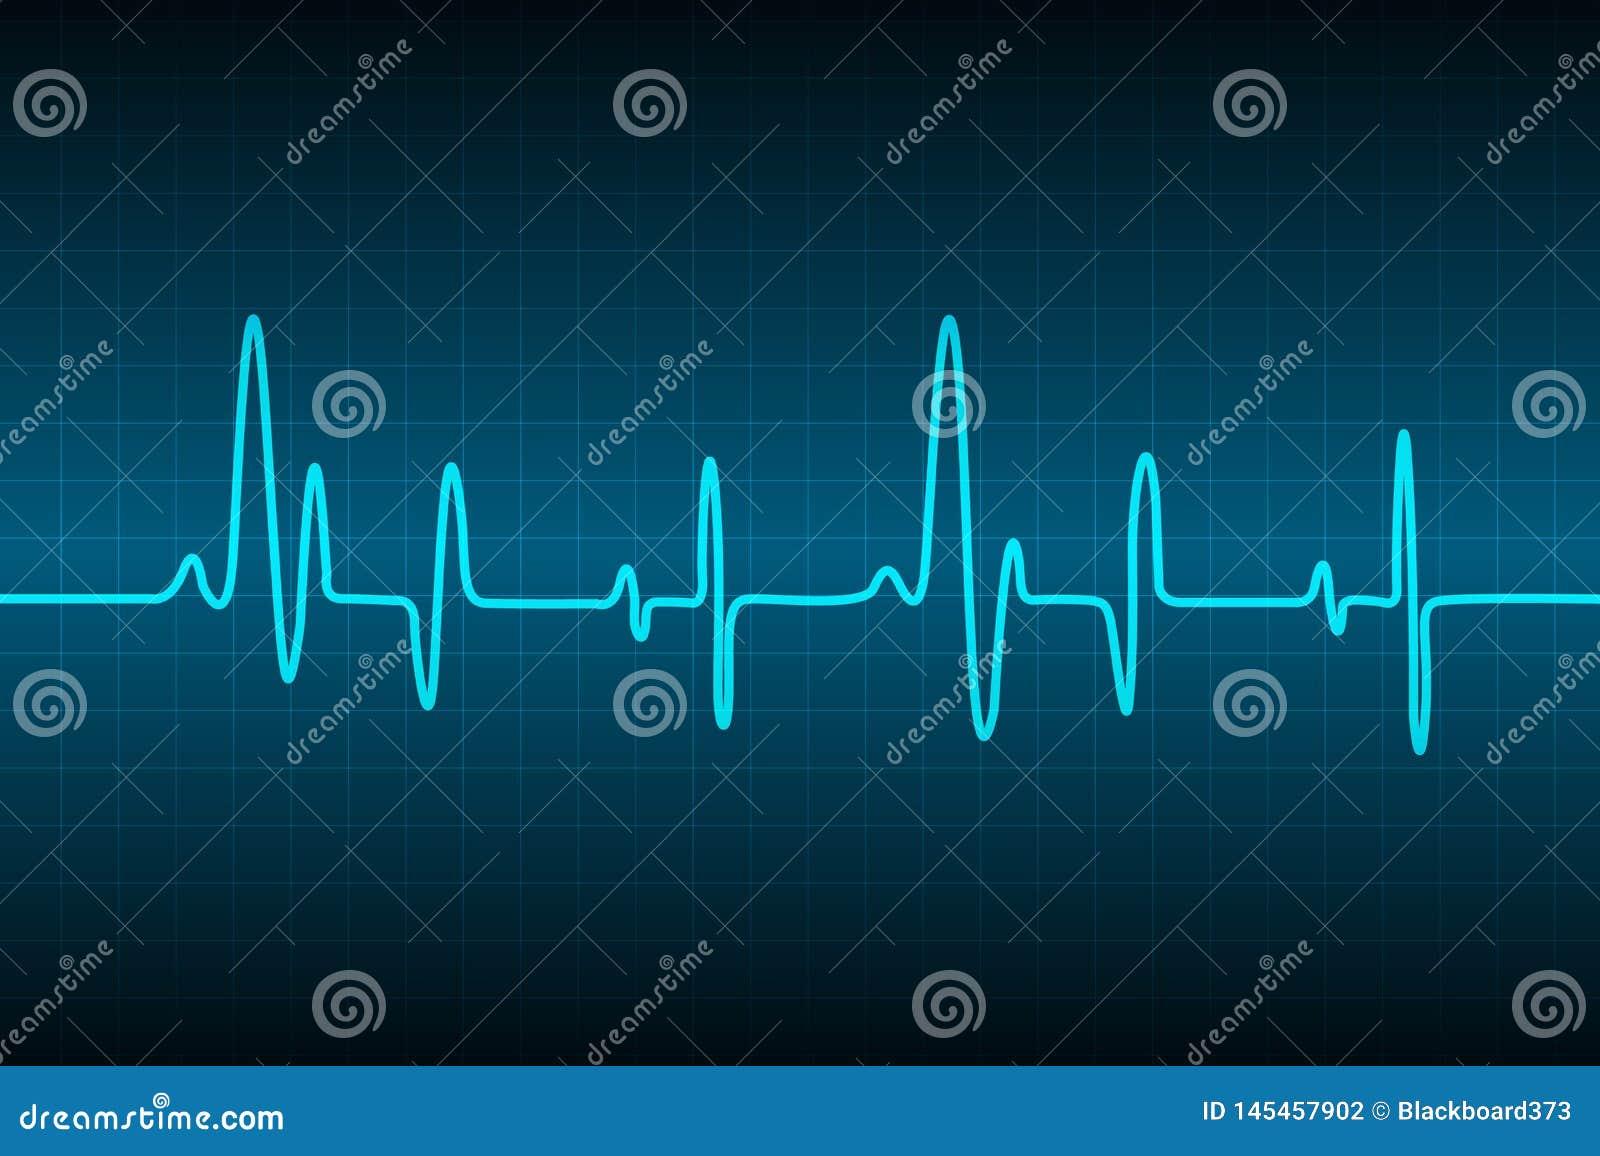 Abstracte medische cardiologie ekg achtergrond, Medische abstracte achtergrond, ecg achtergrond